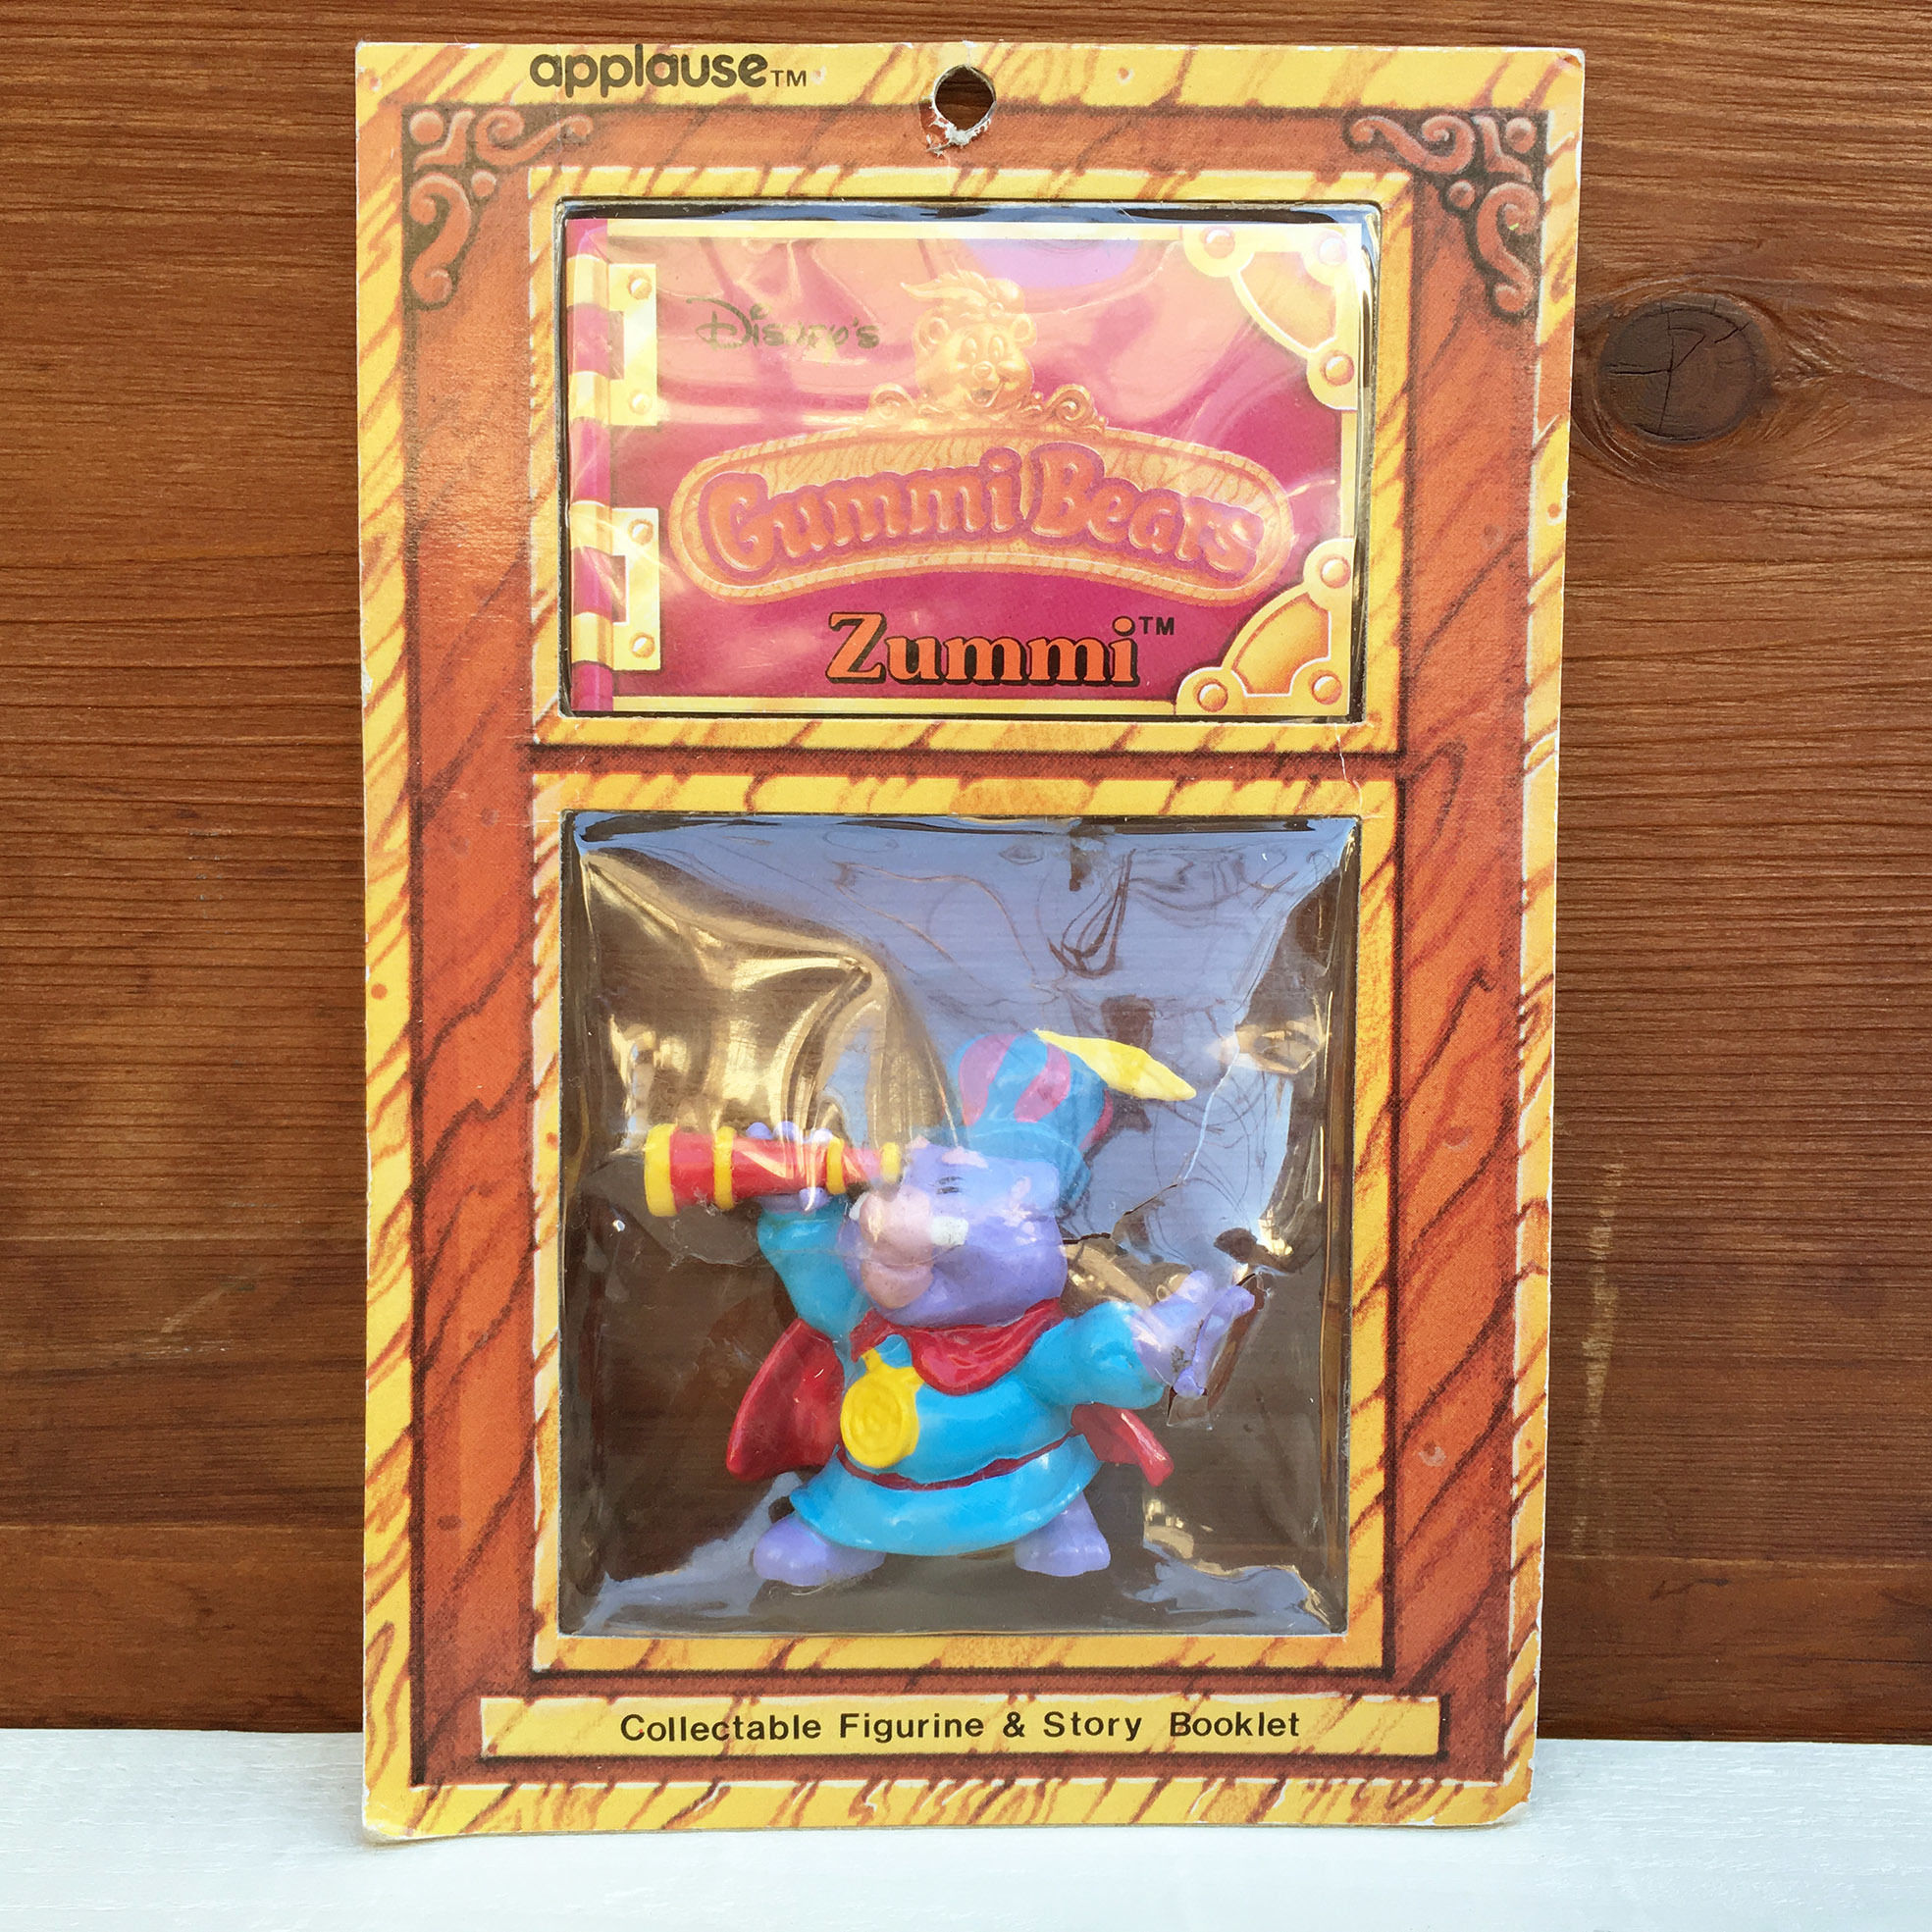 Gummi Bears Zummi PVC Figure/ガミー・ベアの冒険 ザミー PVCフィギュア/171222-3